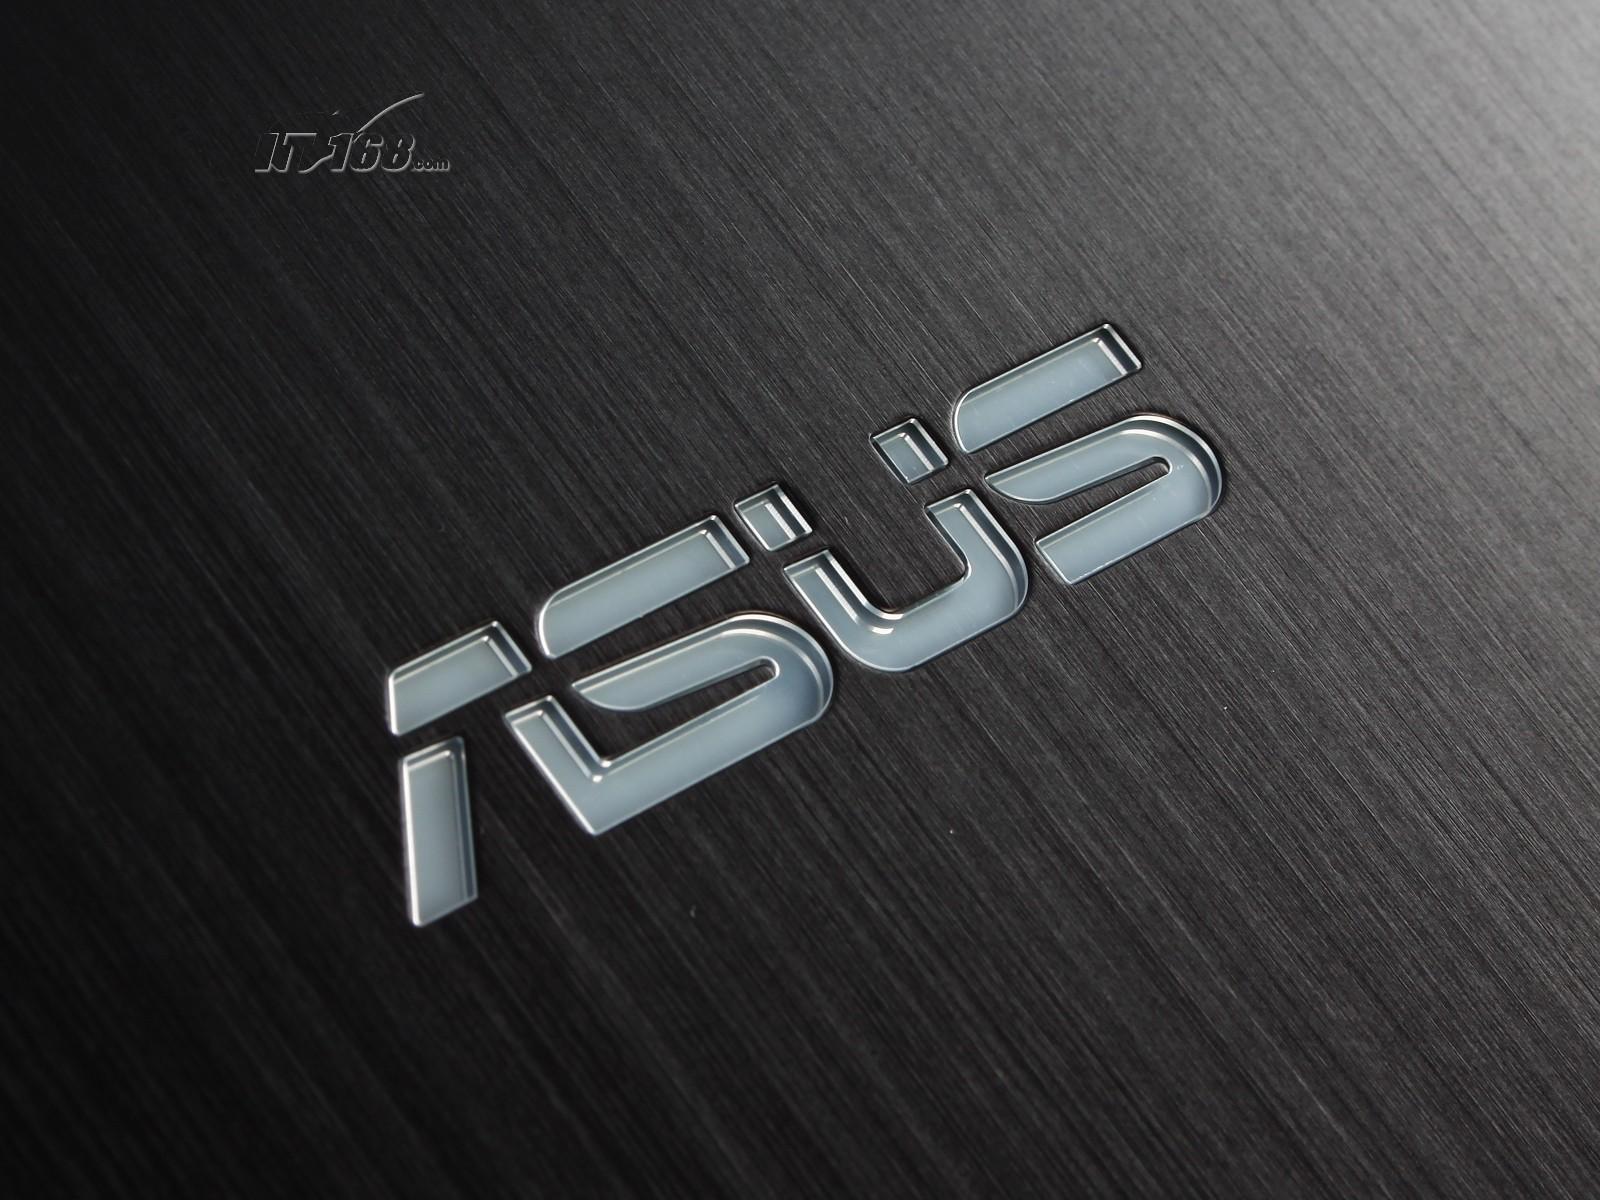 华硕n56x45dp-sl 15.6英寸笔记本电脑(a8-4500m/4g